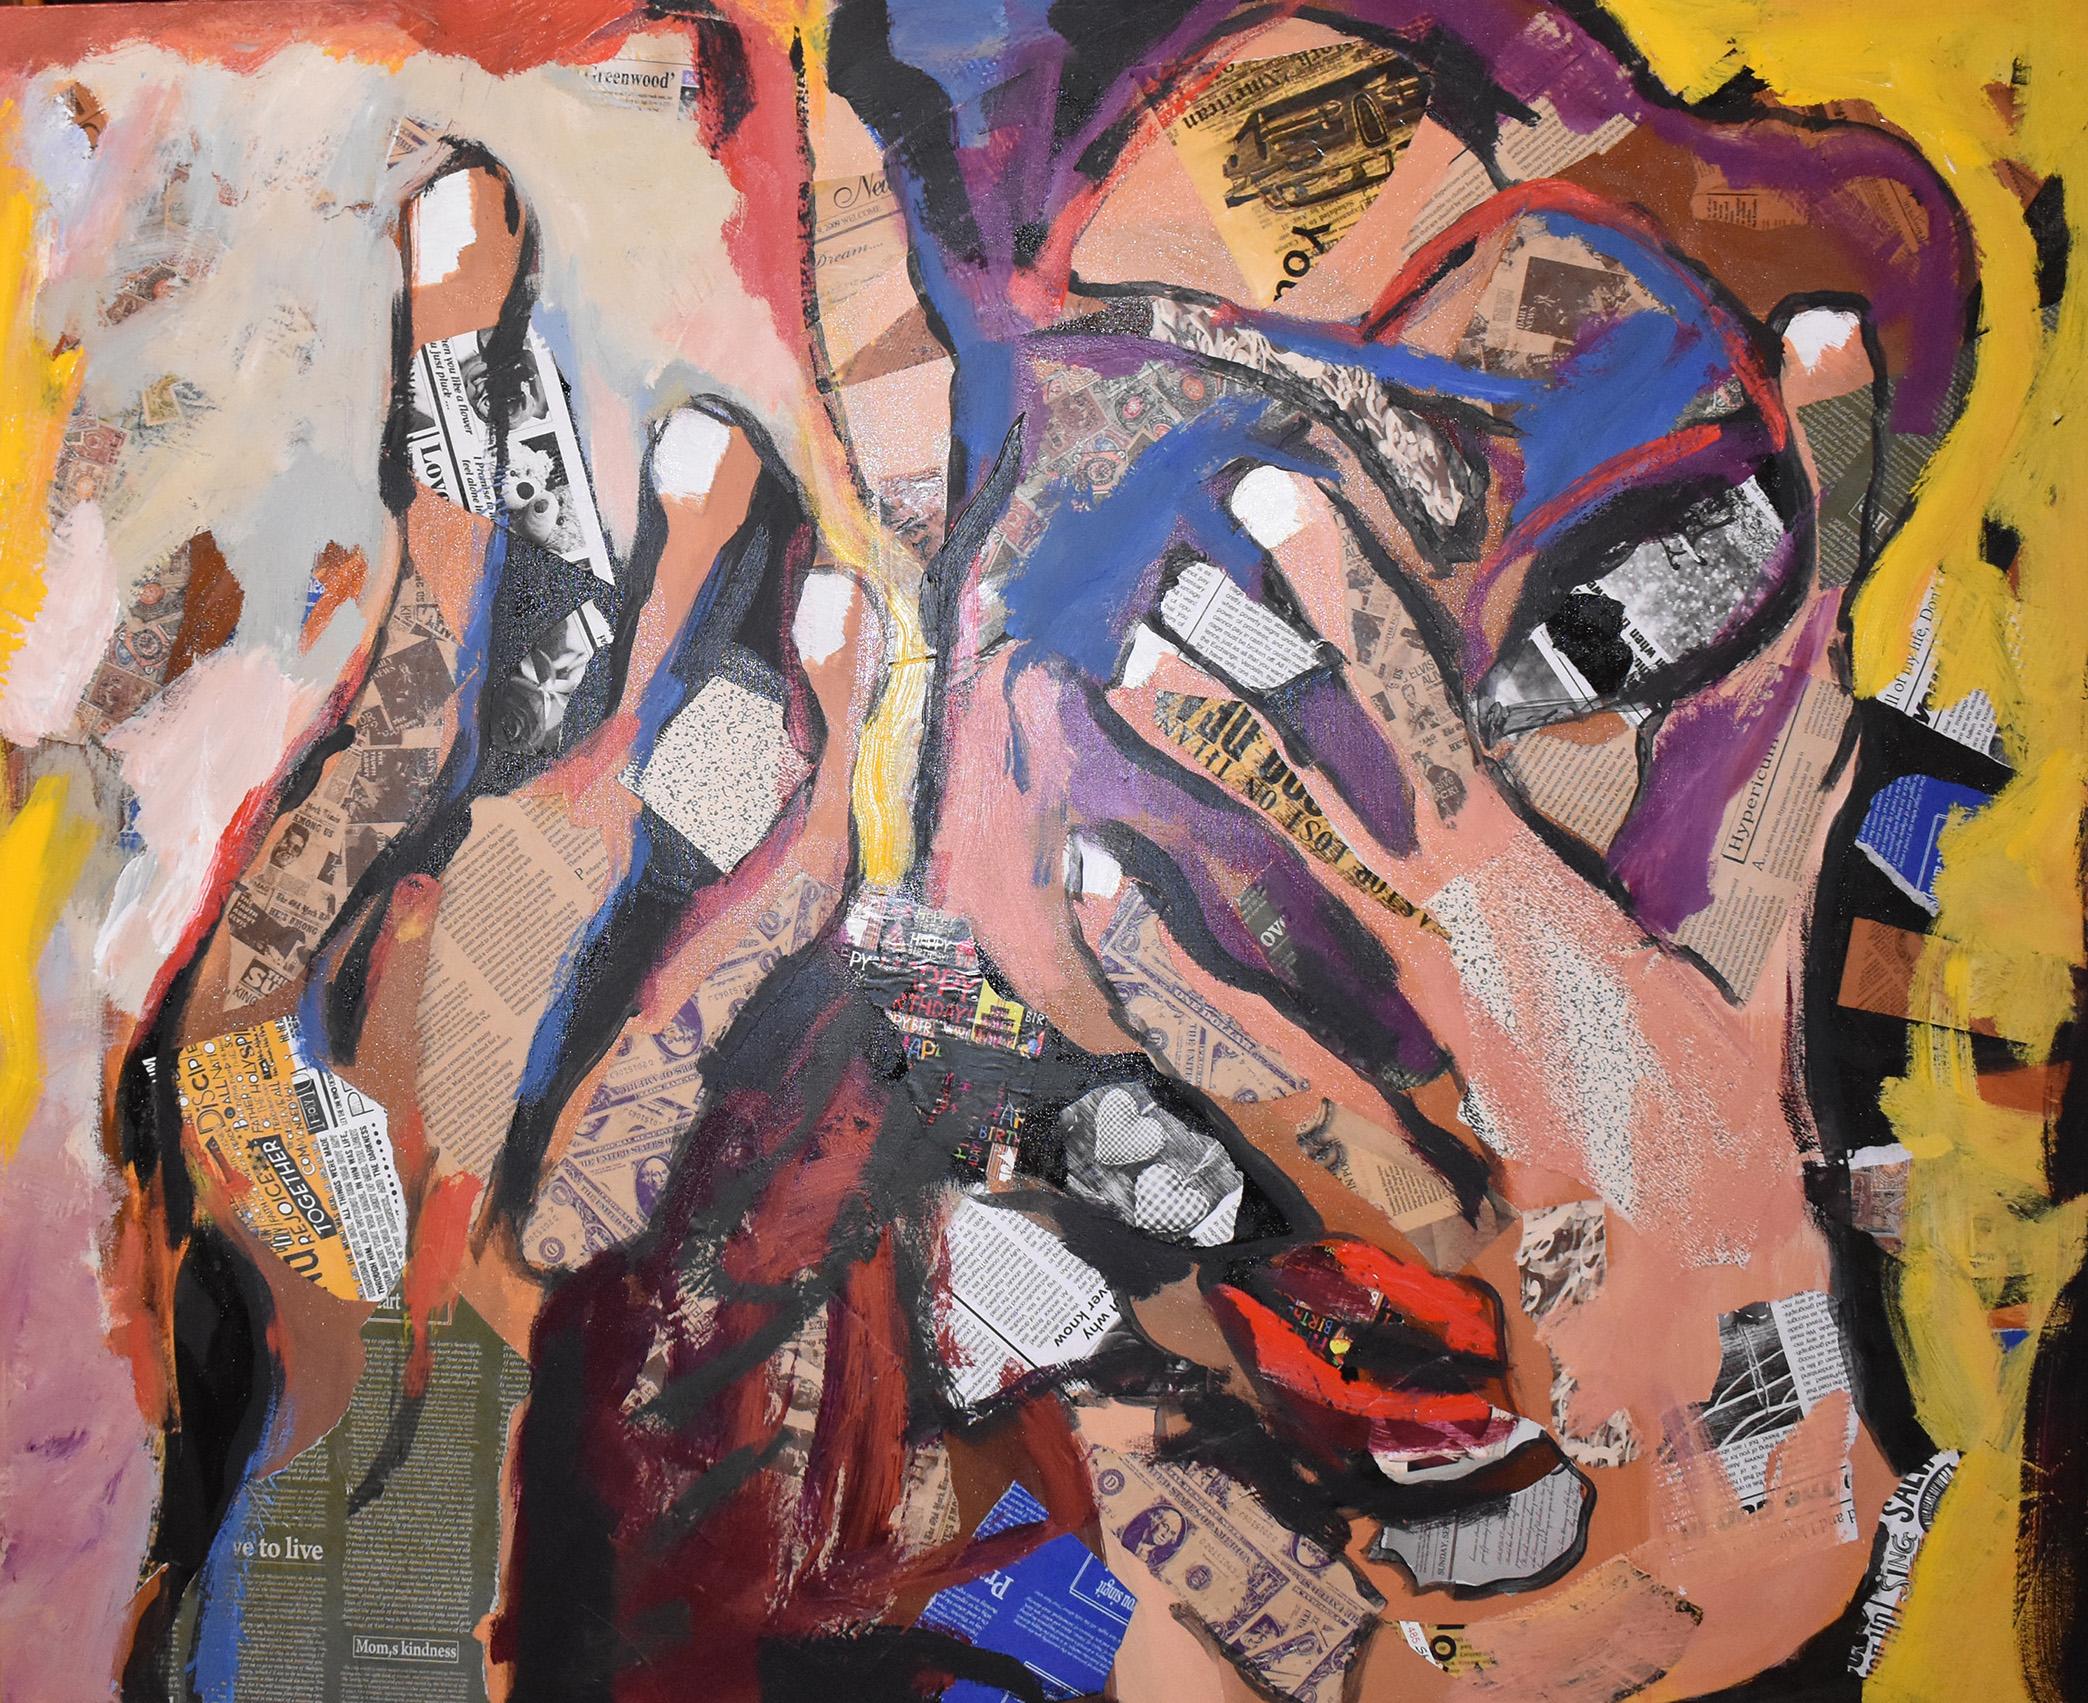 20496922-1-Shirin Moayya-Untitled-Mixed Media Painting on Canvas-43x35in-2017-USD3000.jpg